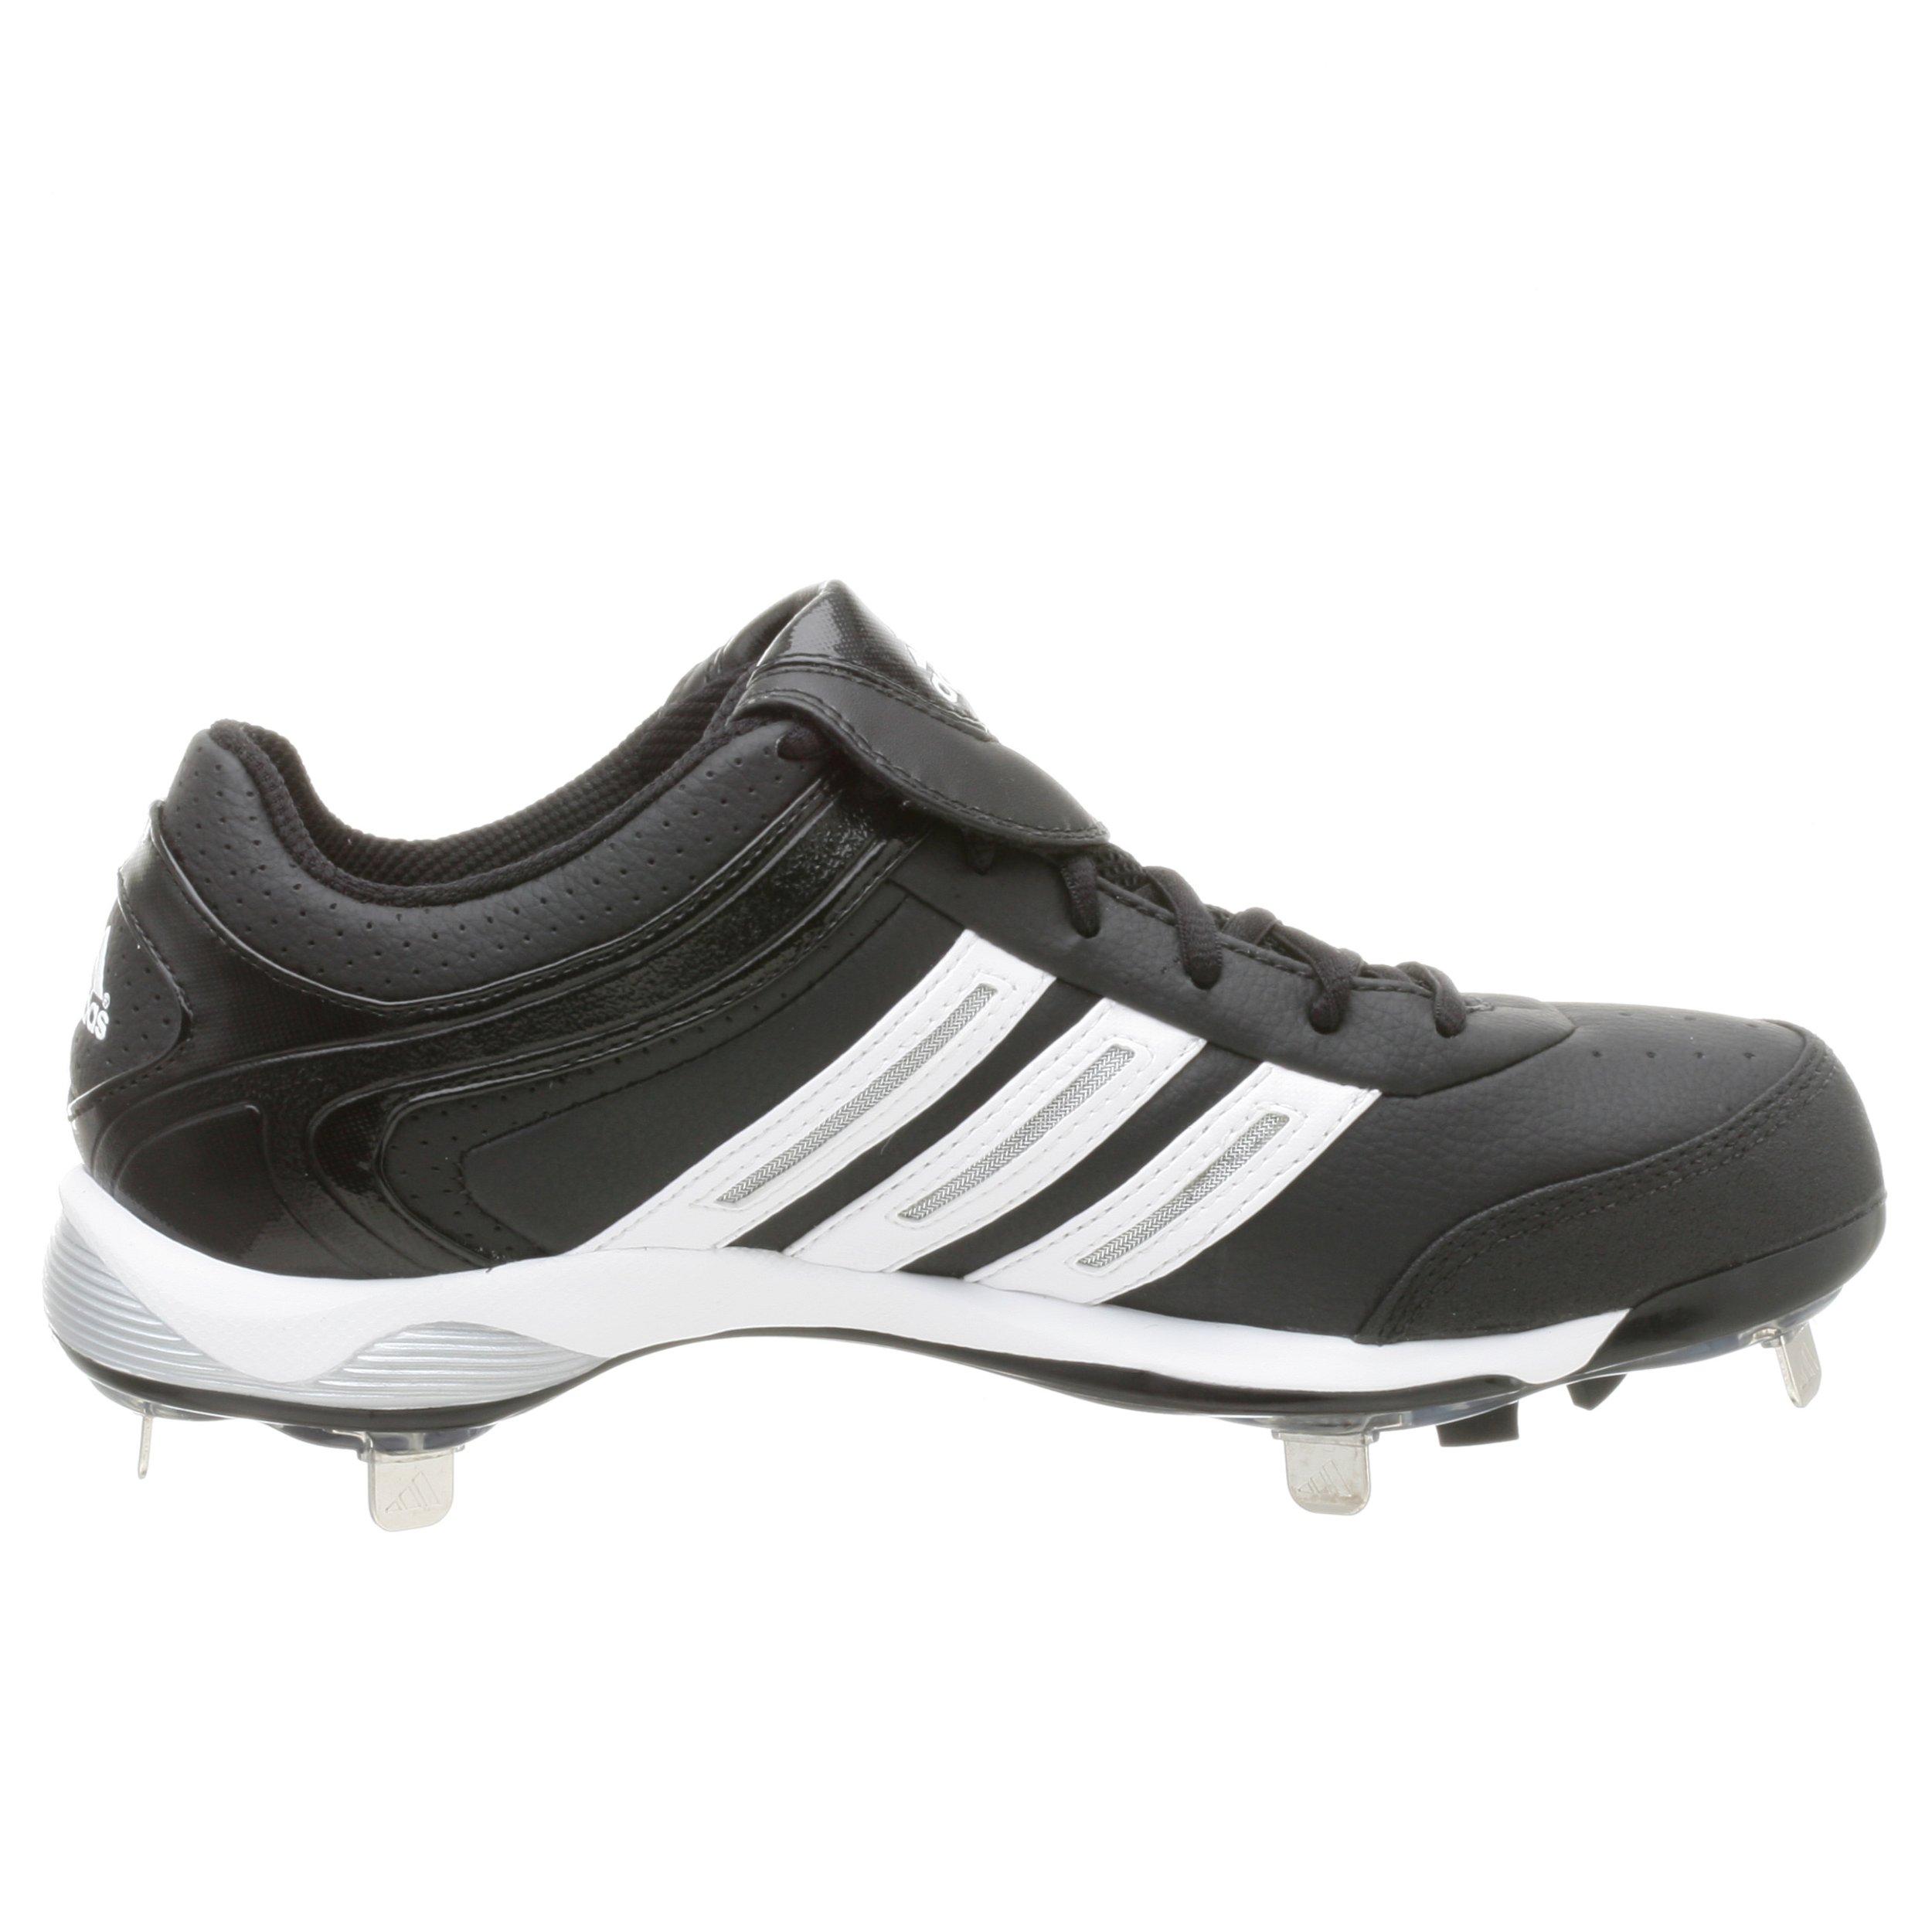 adidas Men's Diamond King Low Baseball Shoe,Blk/Runwht/Metsil,9.5 M by adidas (Image #7)